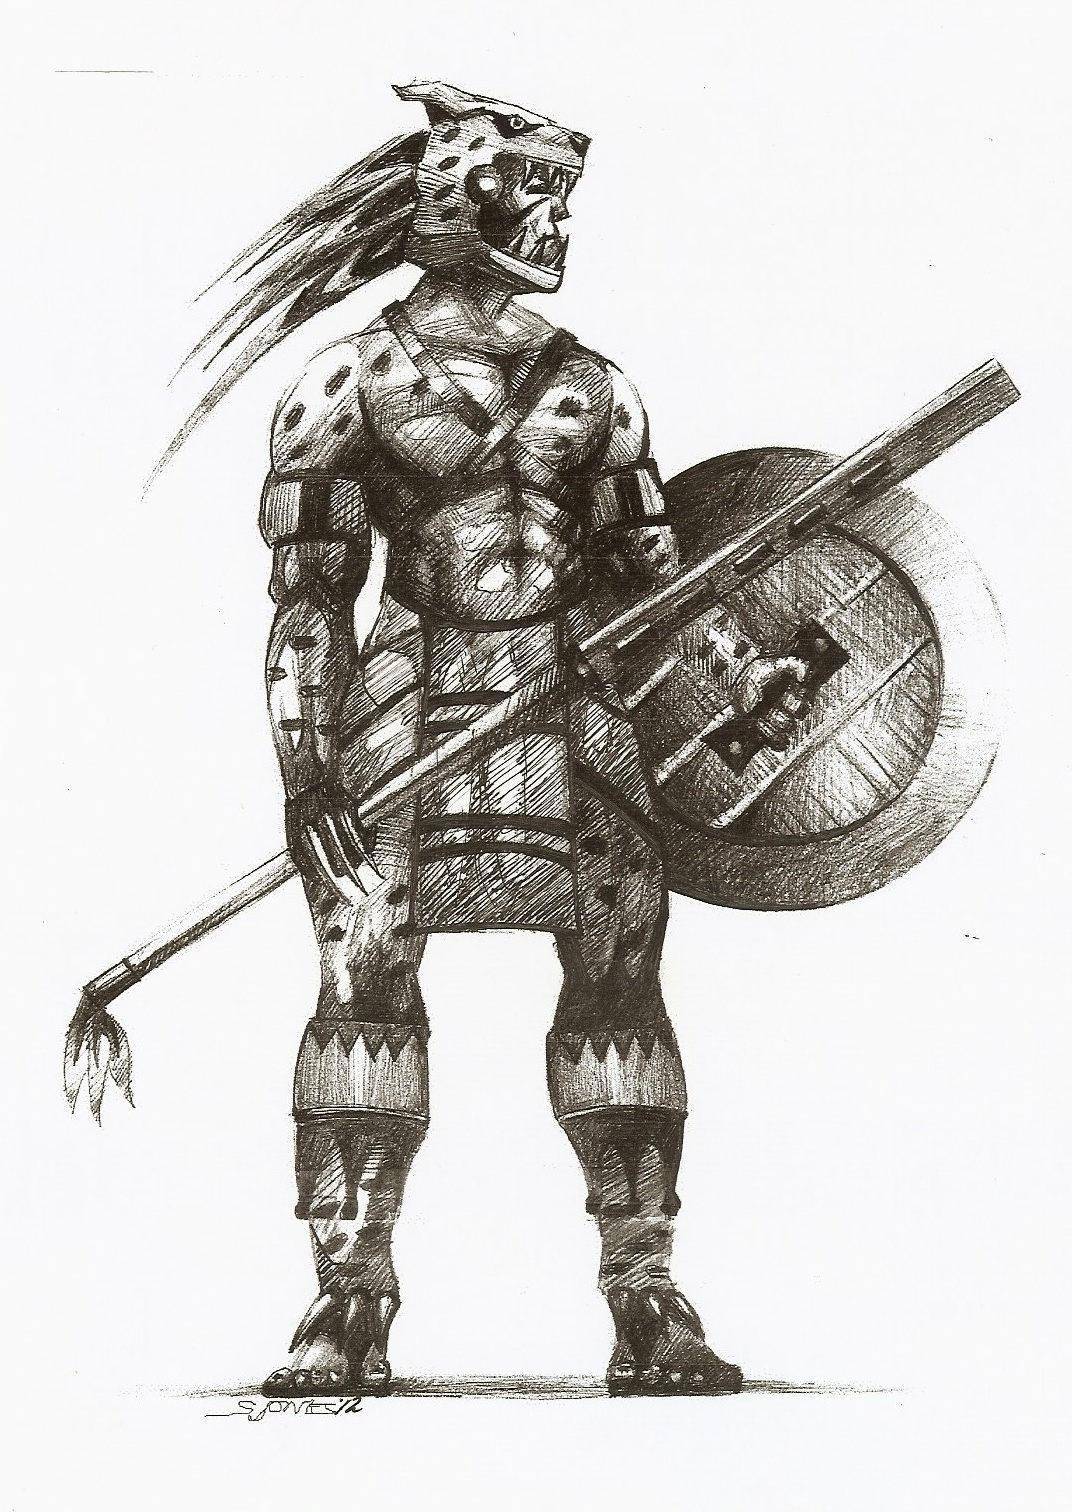 1072x1512 Inside My Crazy Mind Weapons Amp Warriors Aztecs Warriors